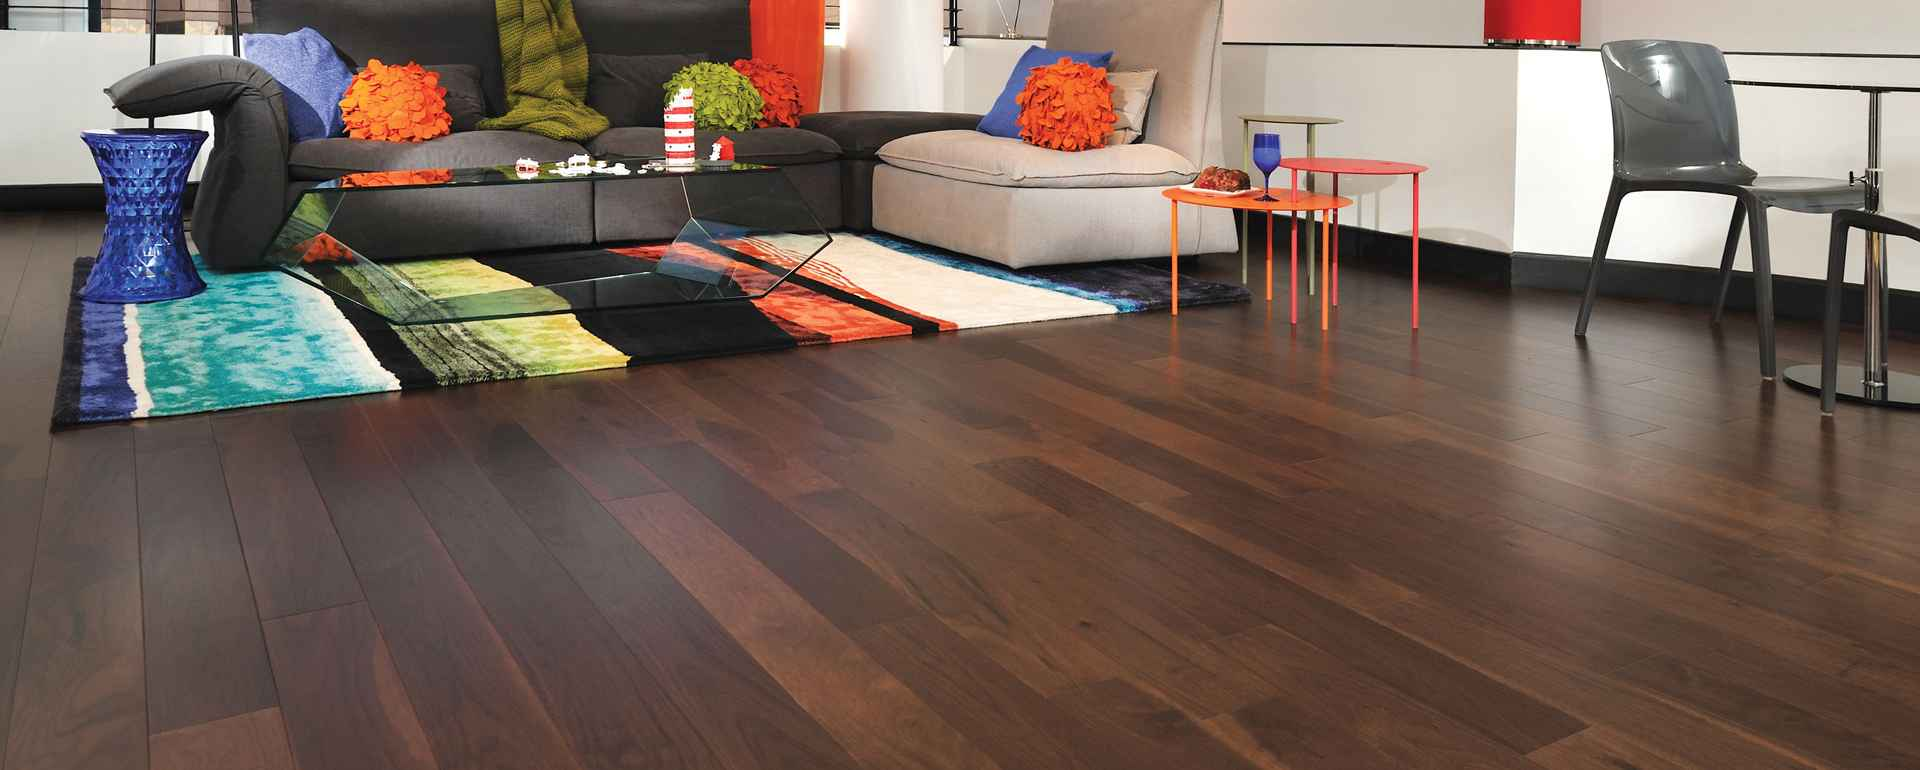 Gerflor India  Vinyl Flooring  indiana floors and more